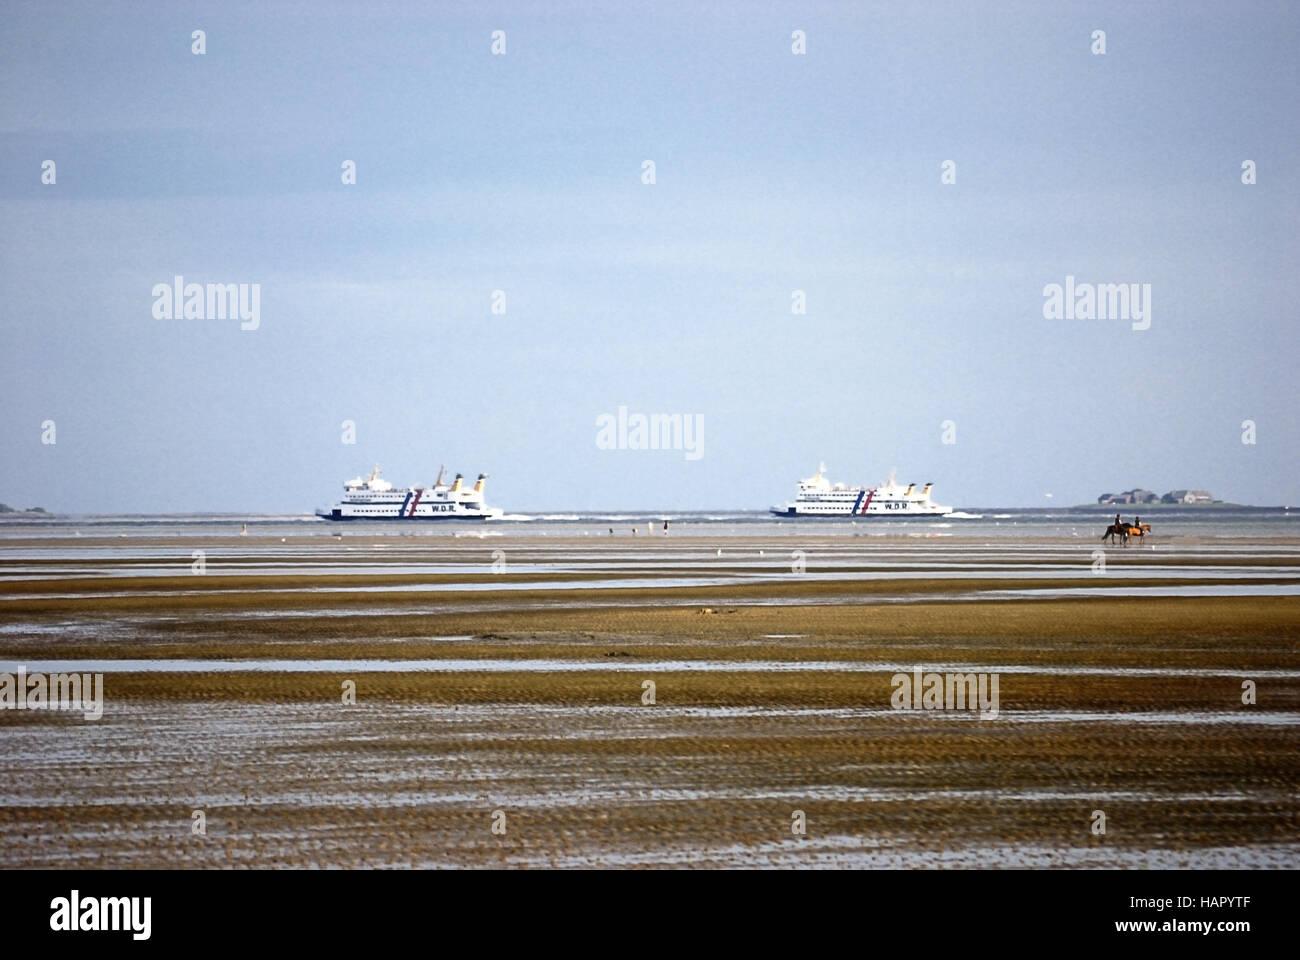 Faehren+Pferde - ferrys+horses - Stock Image